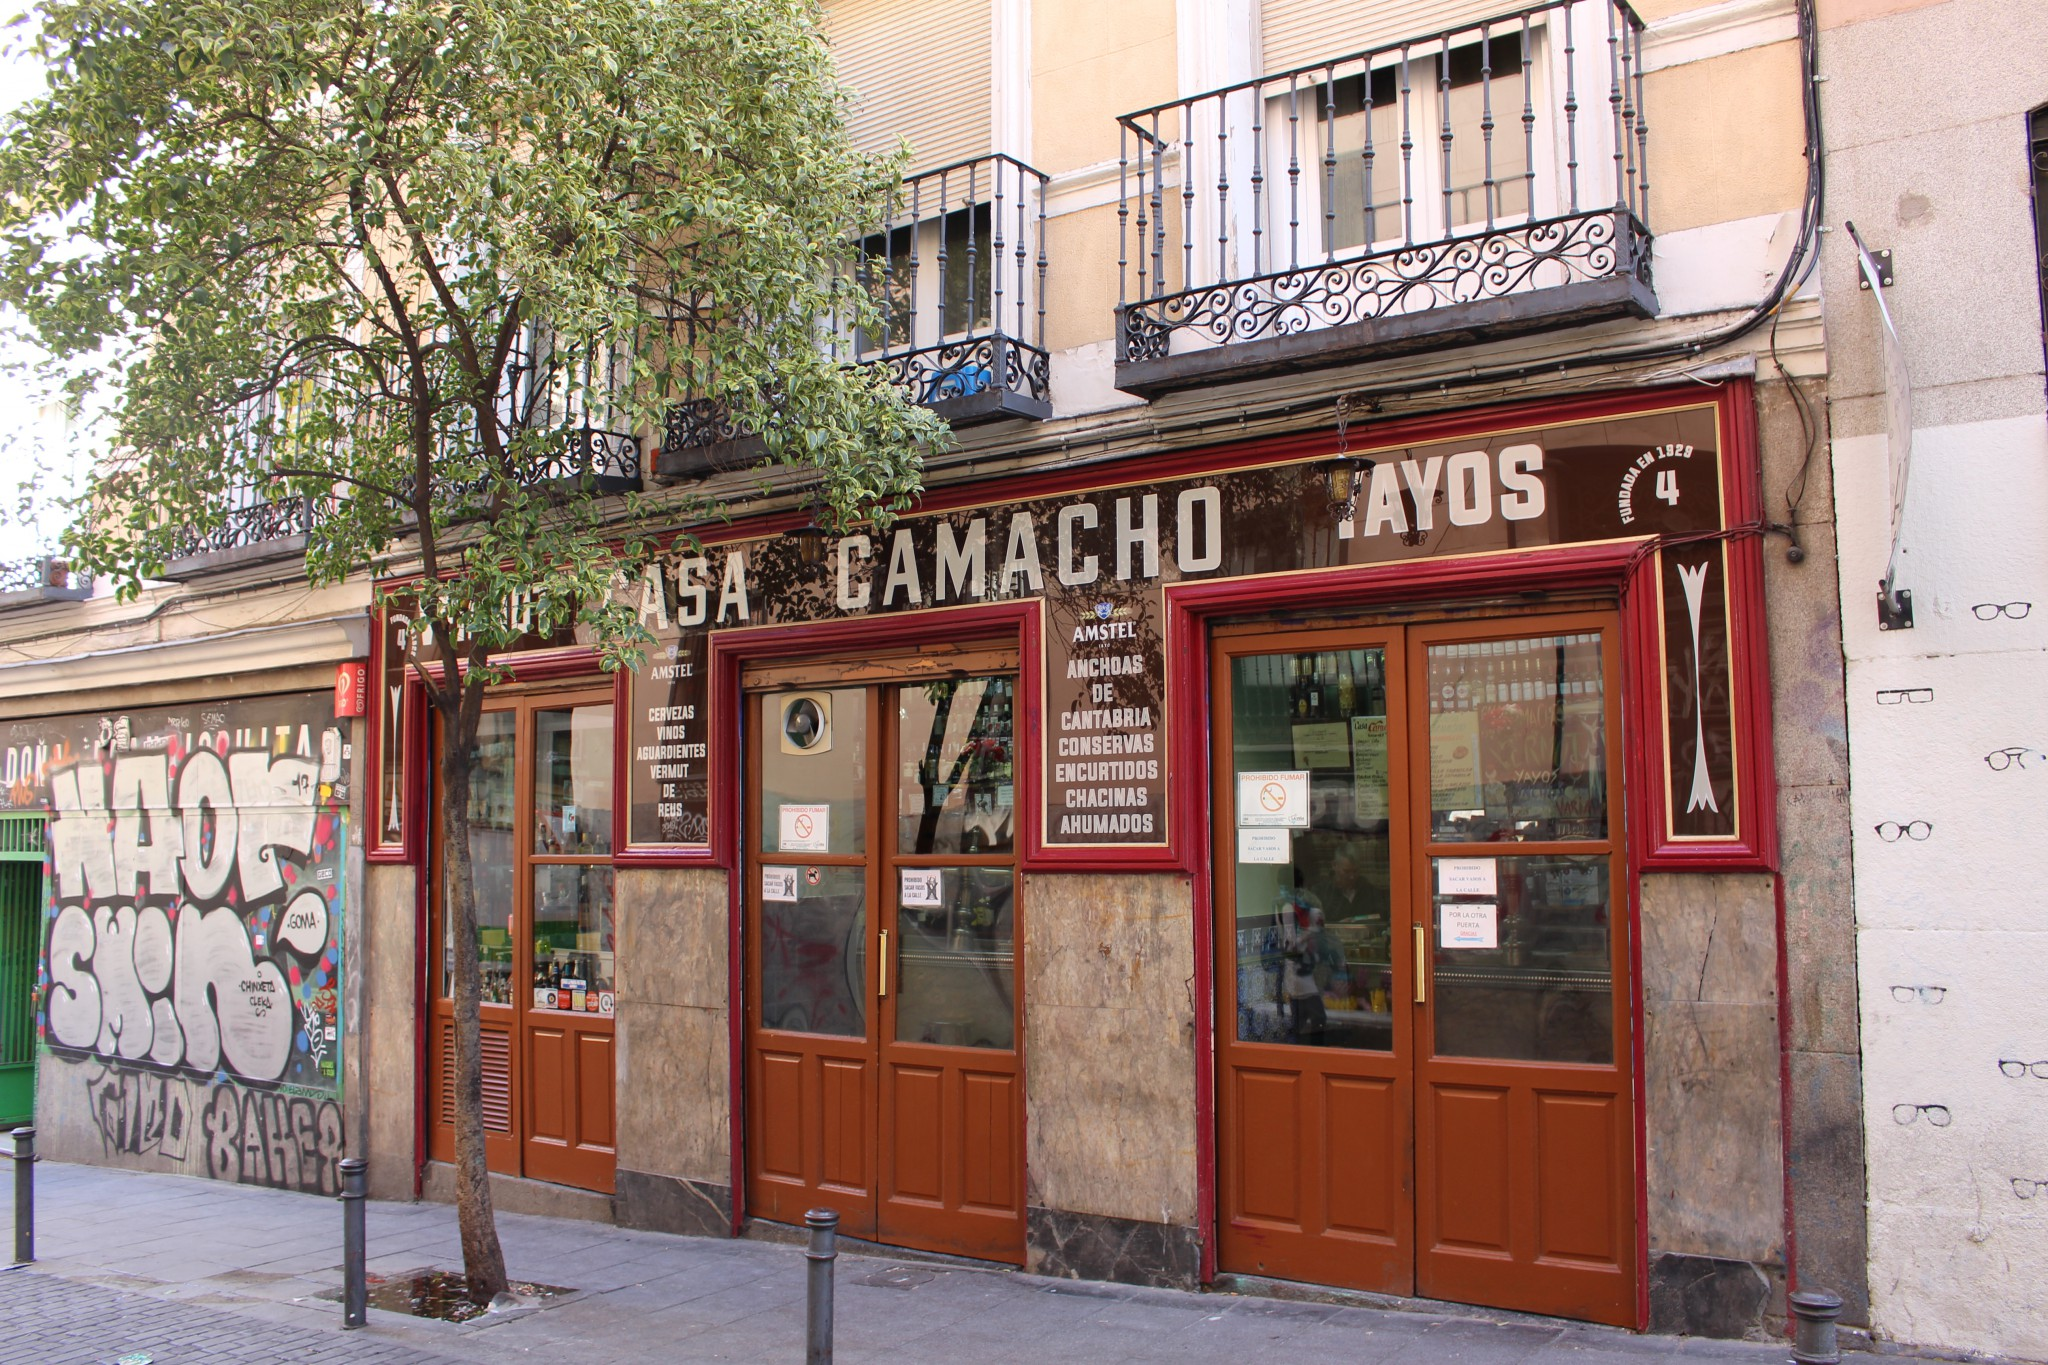 Casa Camacho - Tabernas Madrid